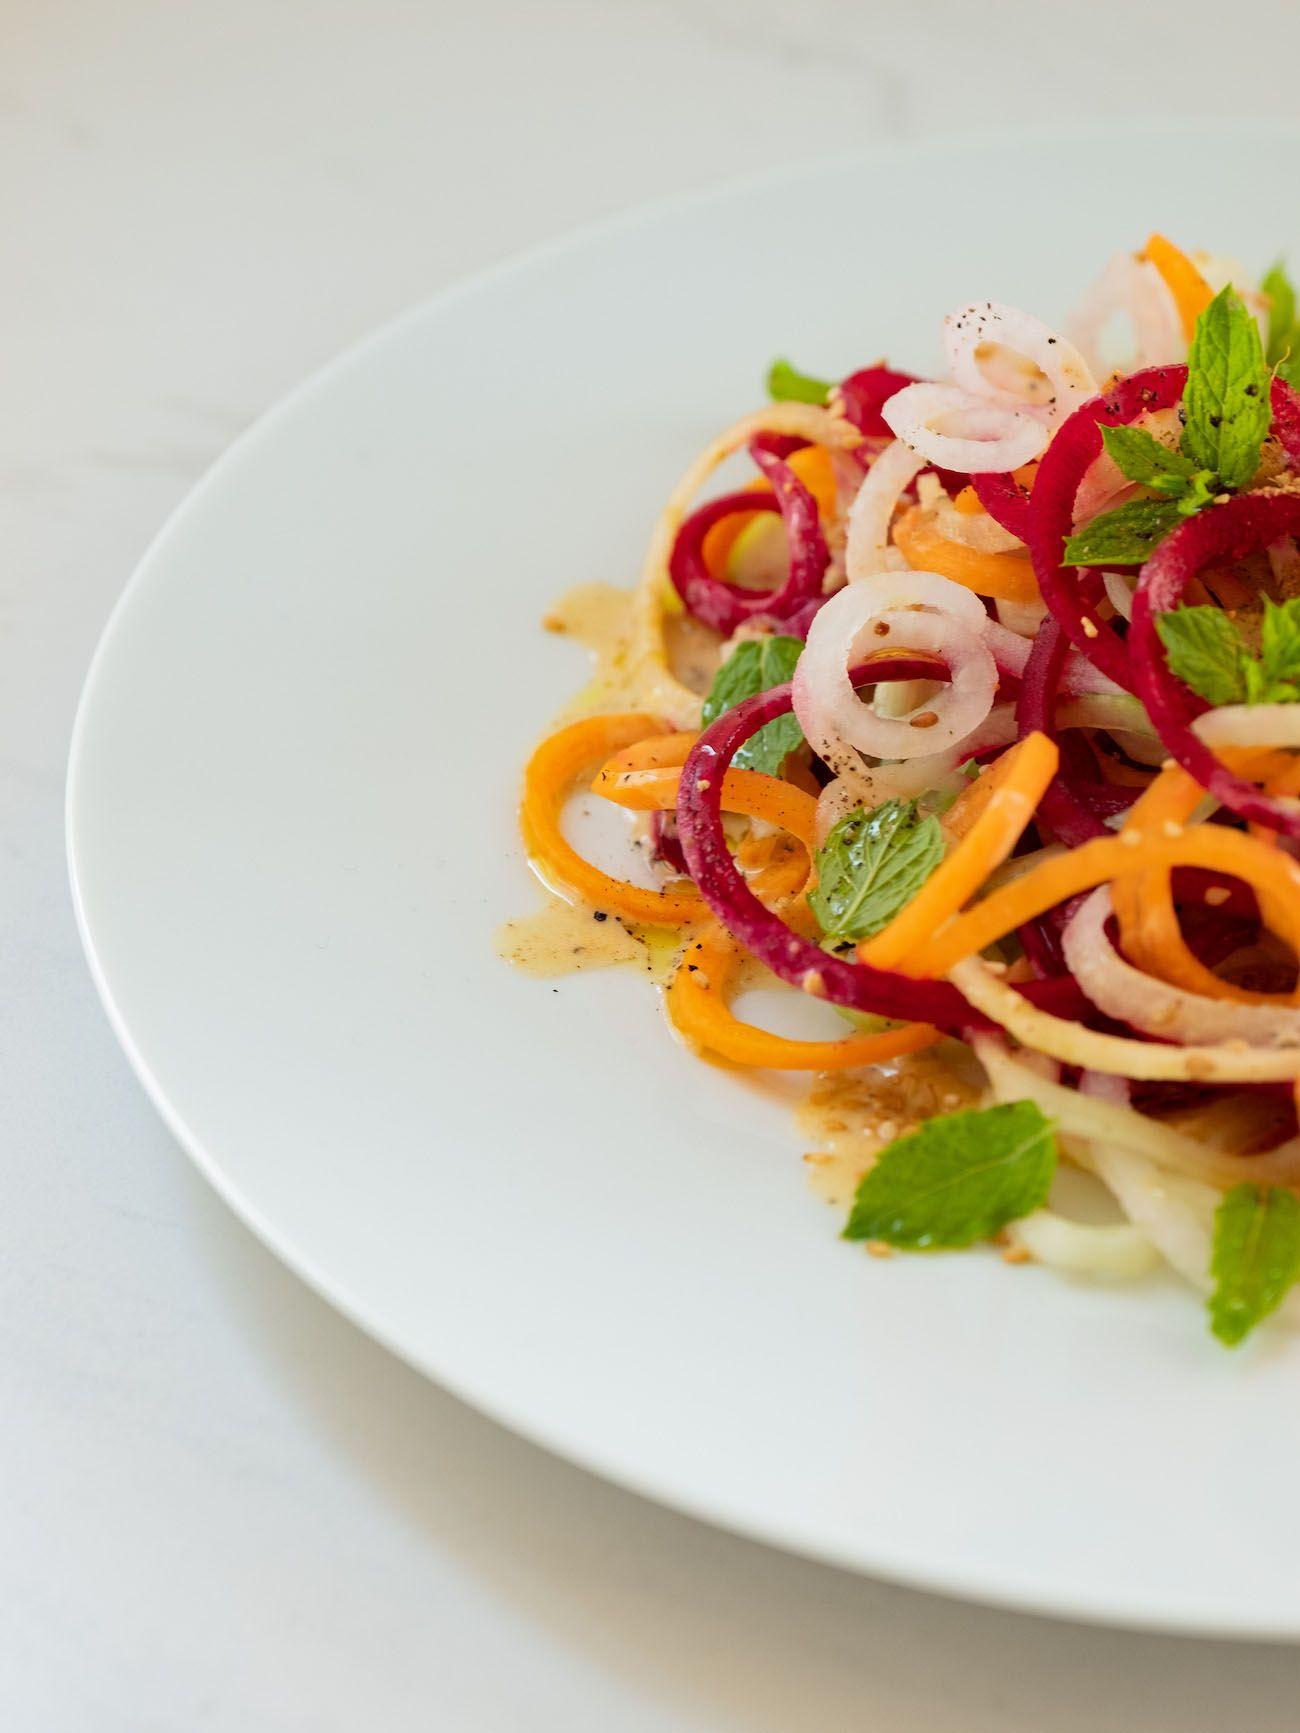 About Fuel, Foodblog, Rezept, Bunter Spiralensalat mit Tahini-Dressing, Rote Bete, Karotte, Minze